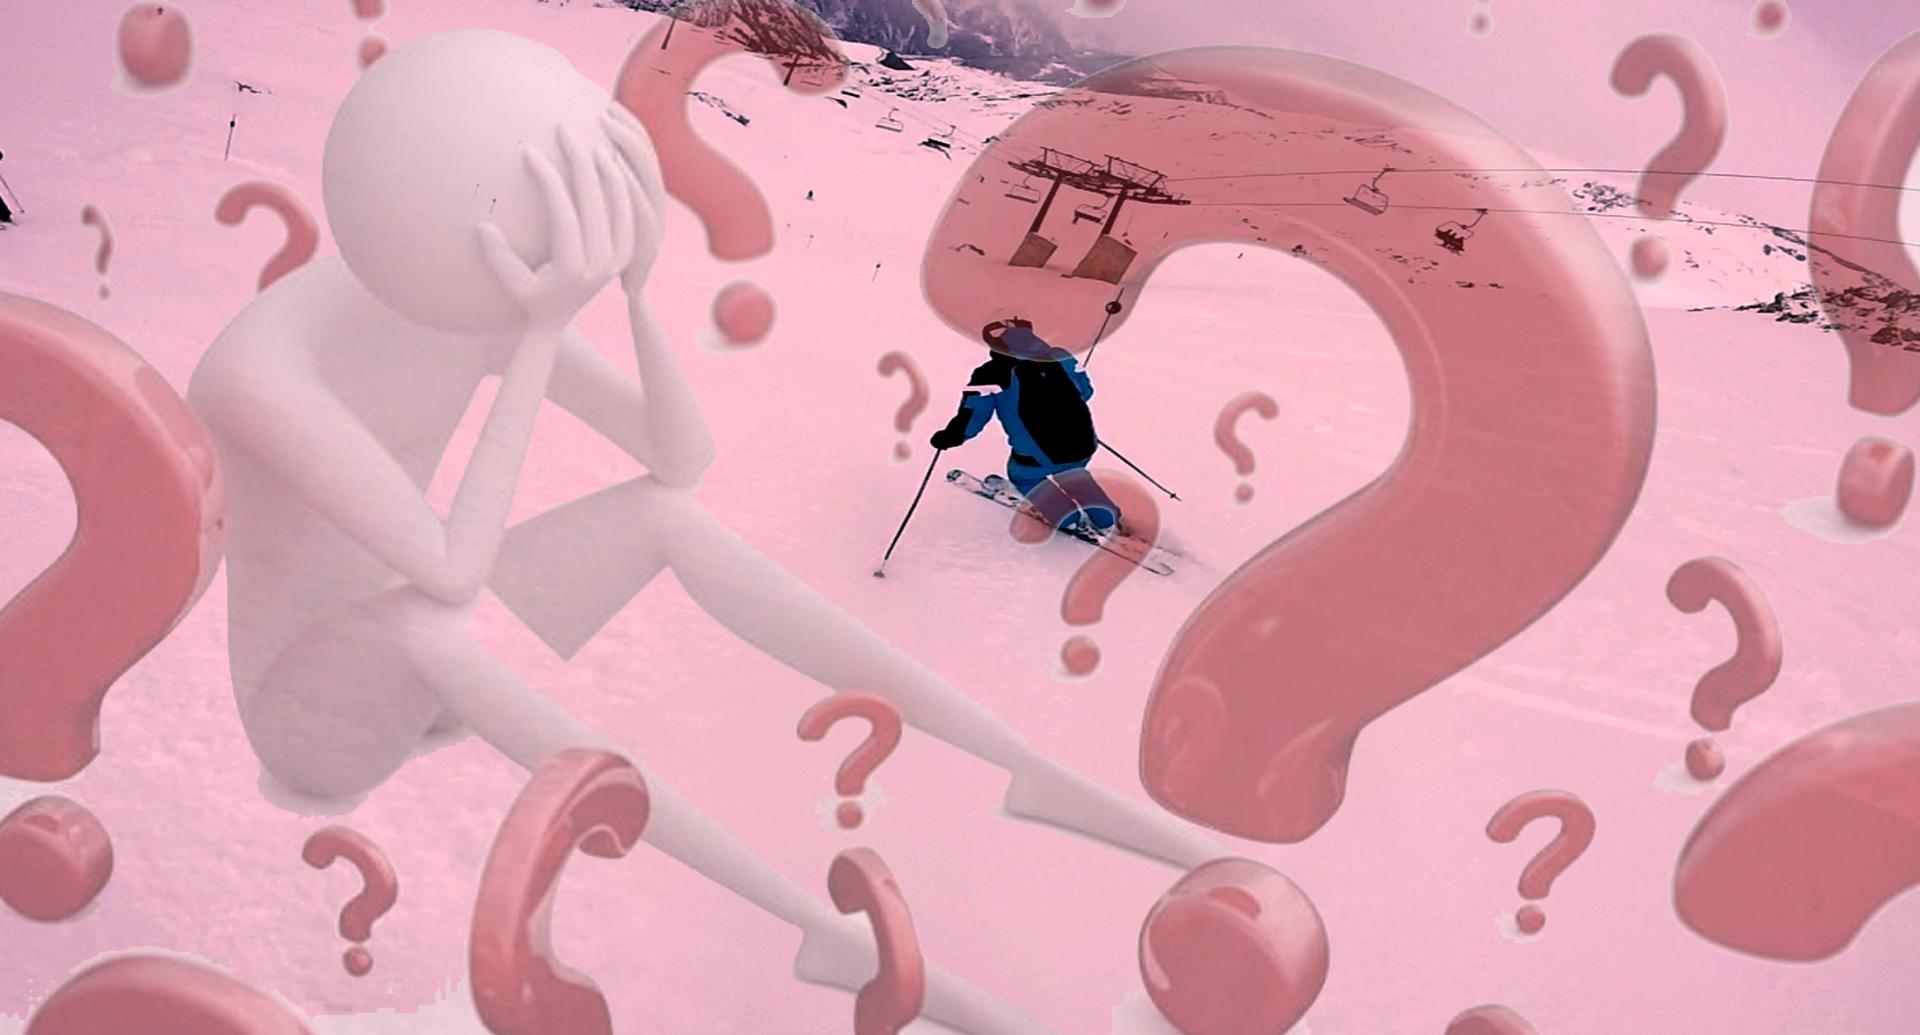 Incertidumbre en el esquí